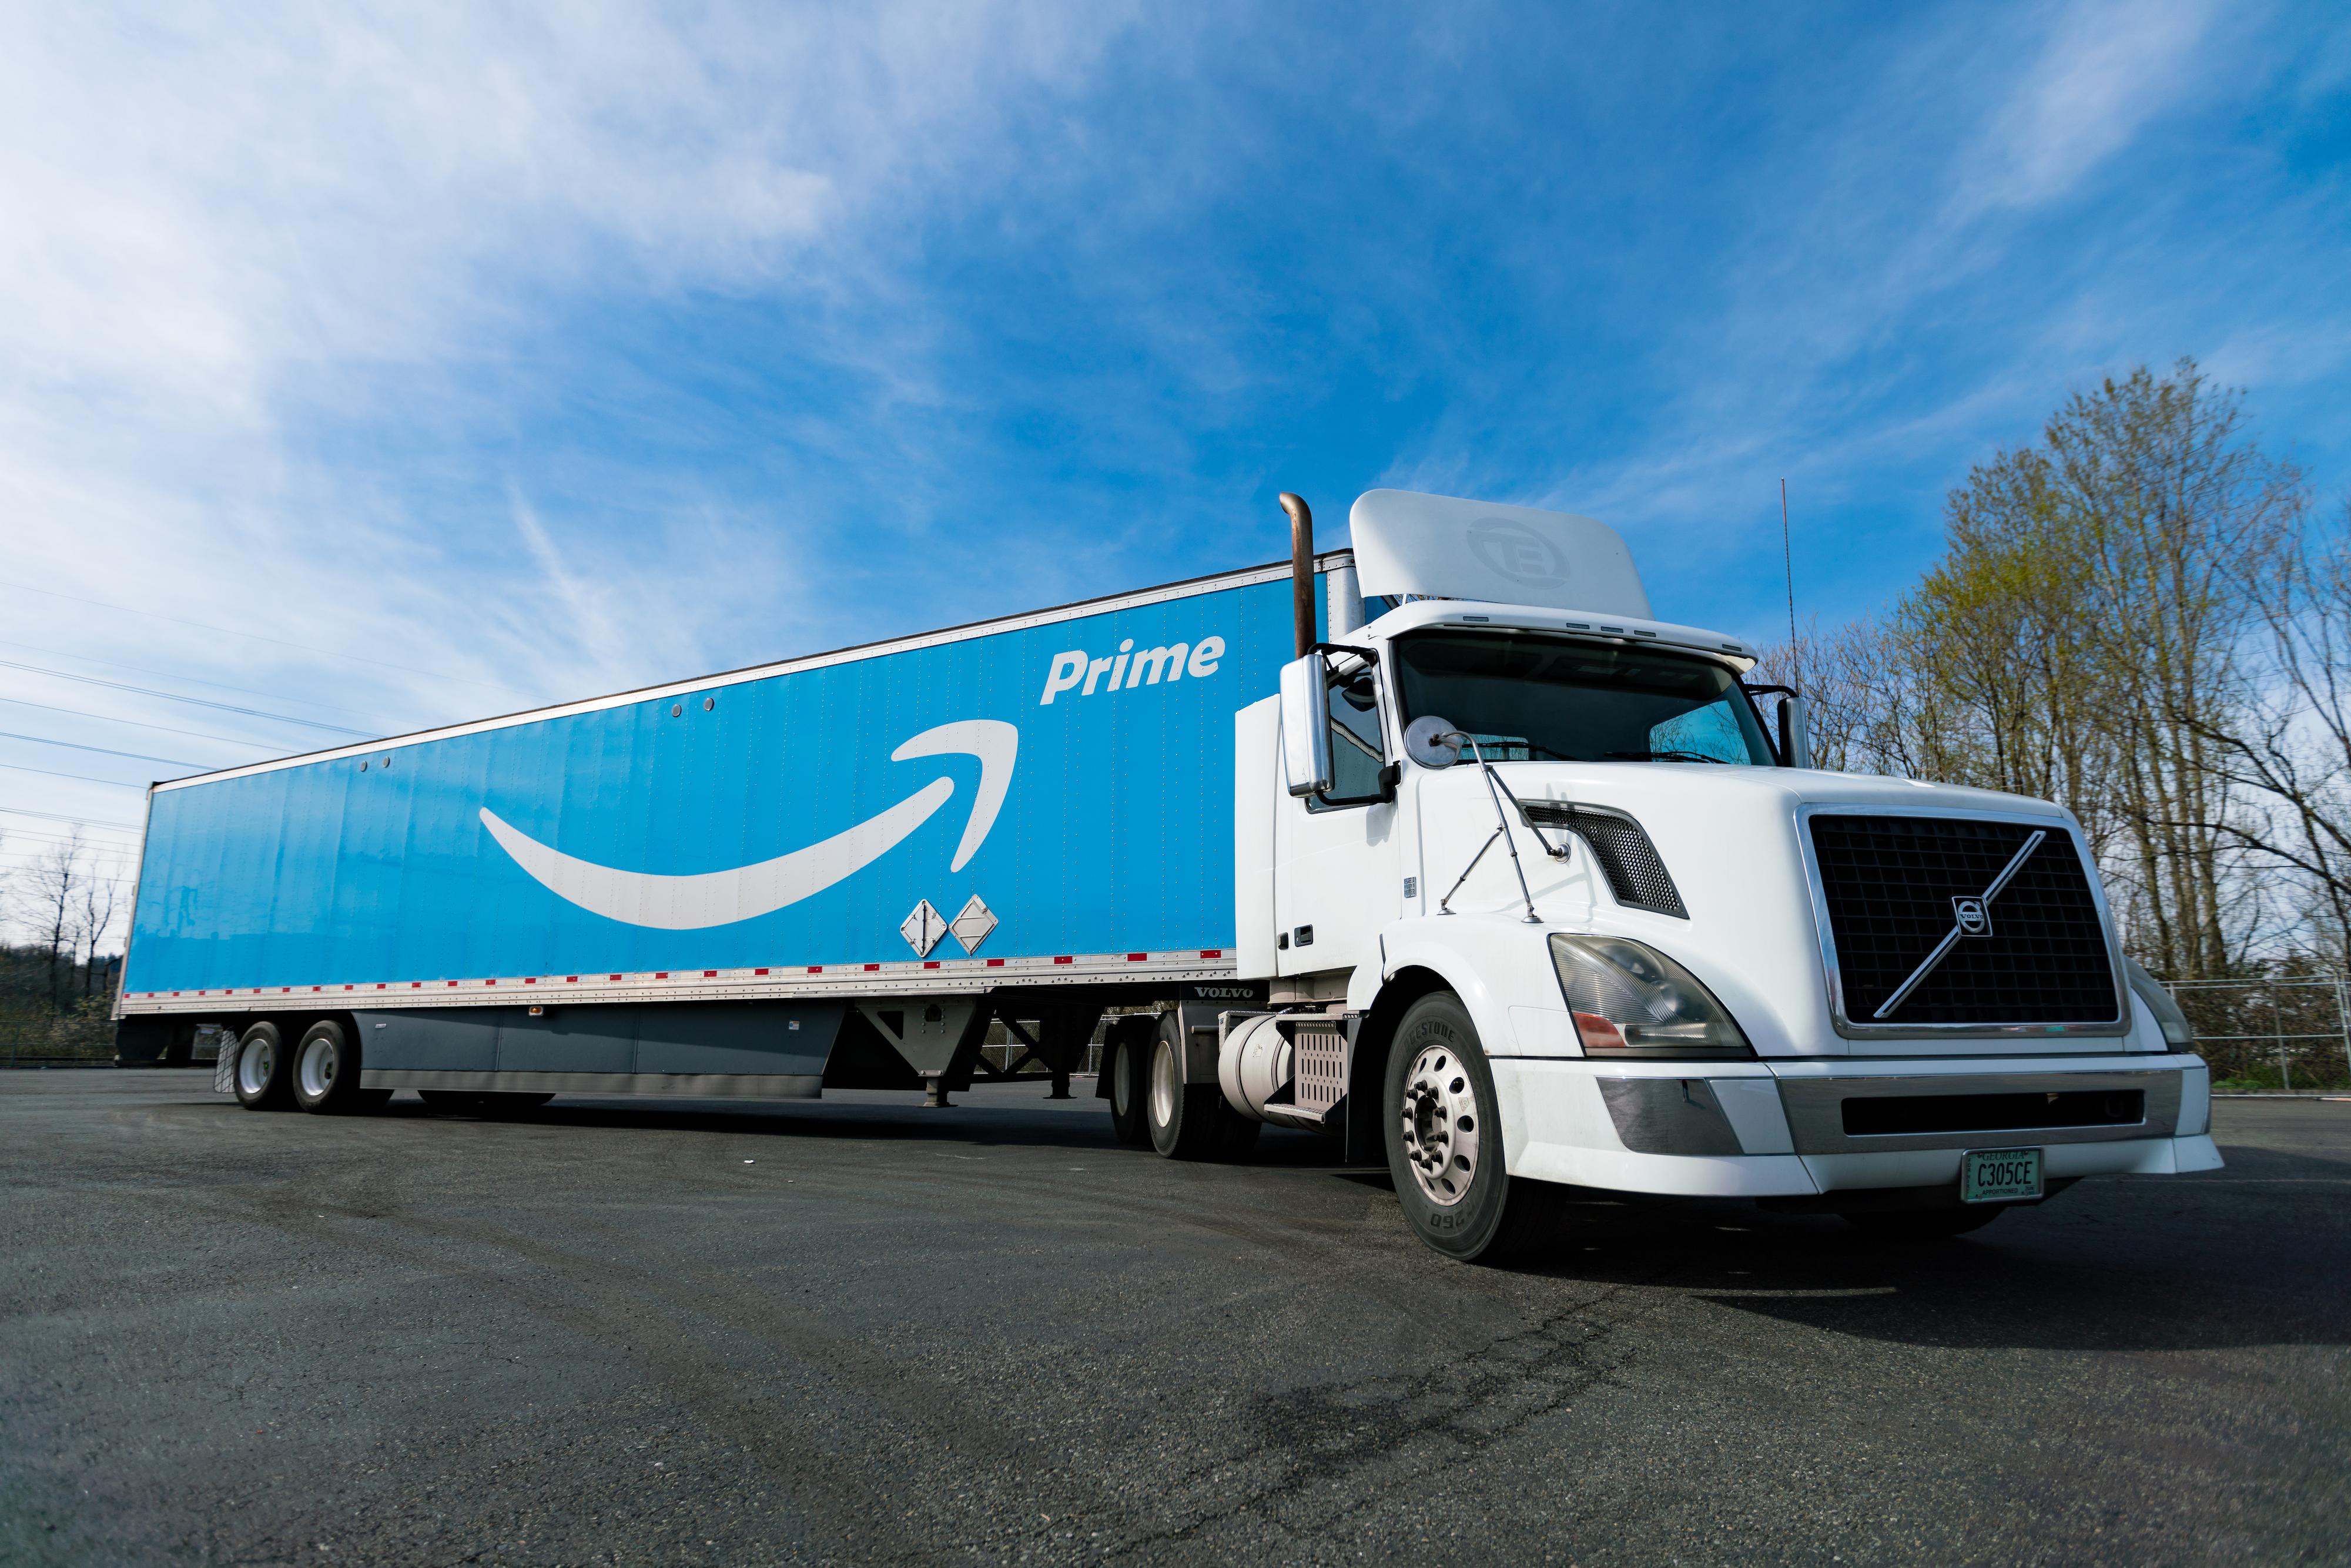 Amazon Prime delivery semitrailer